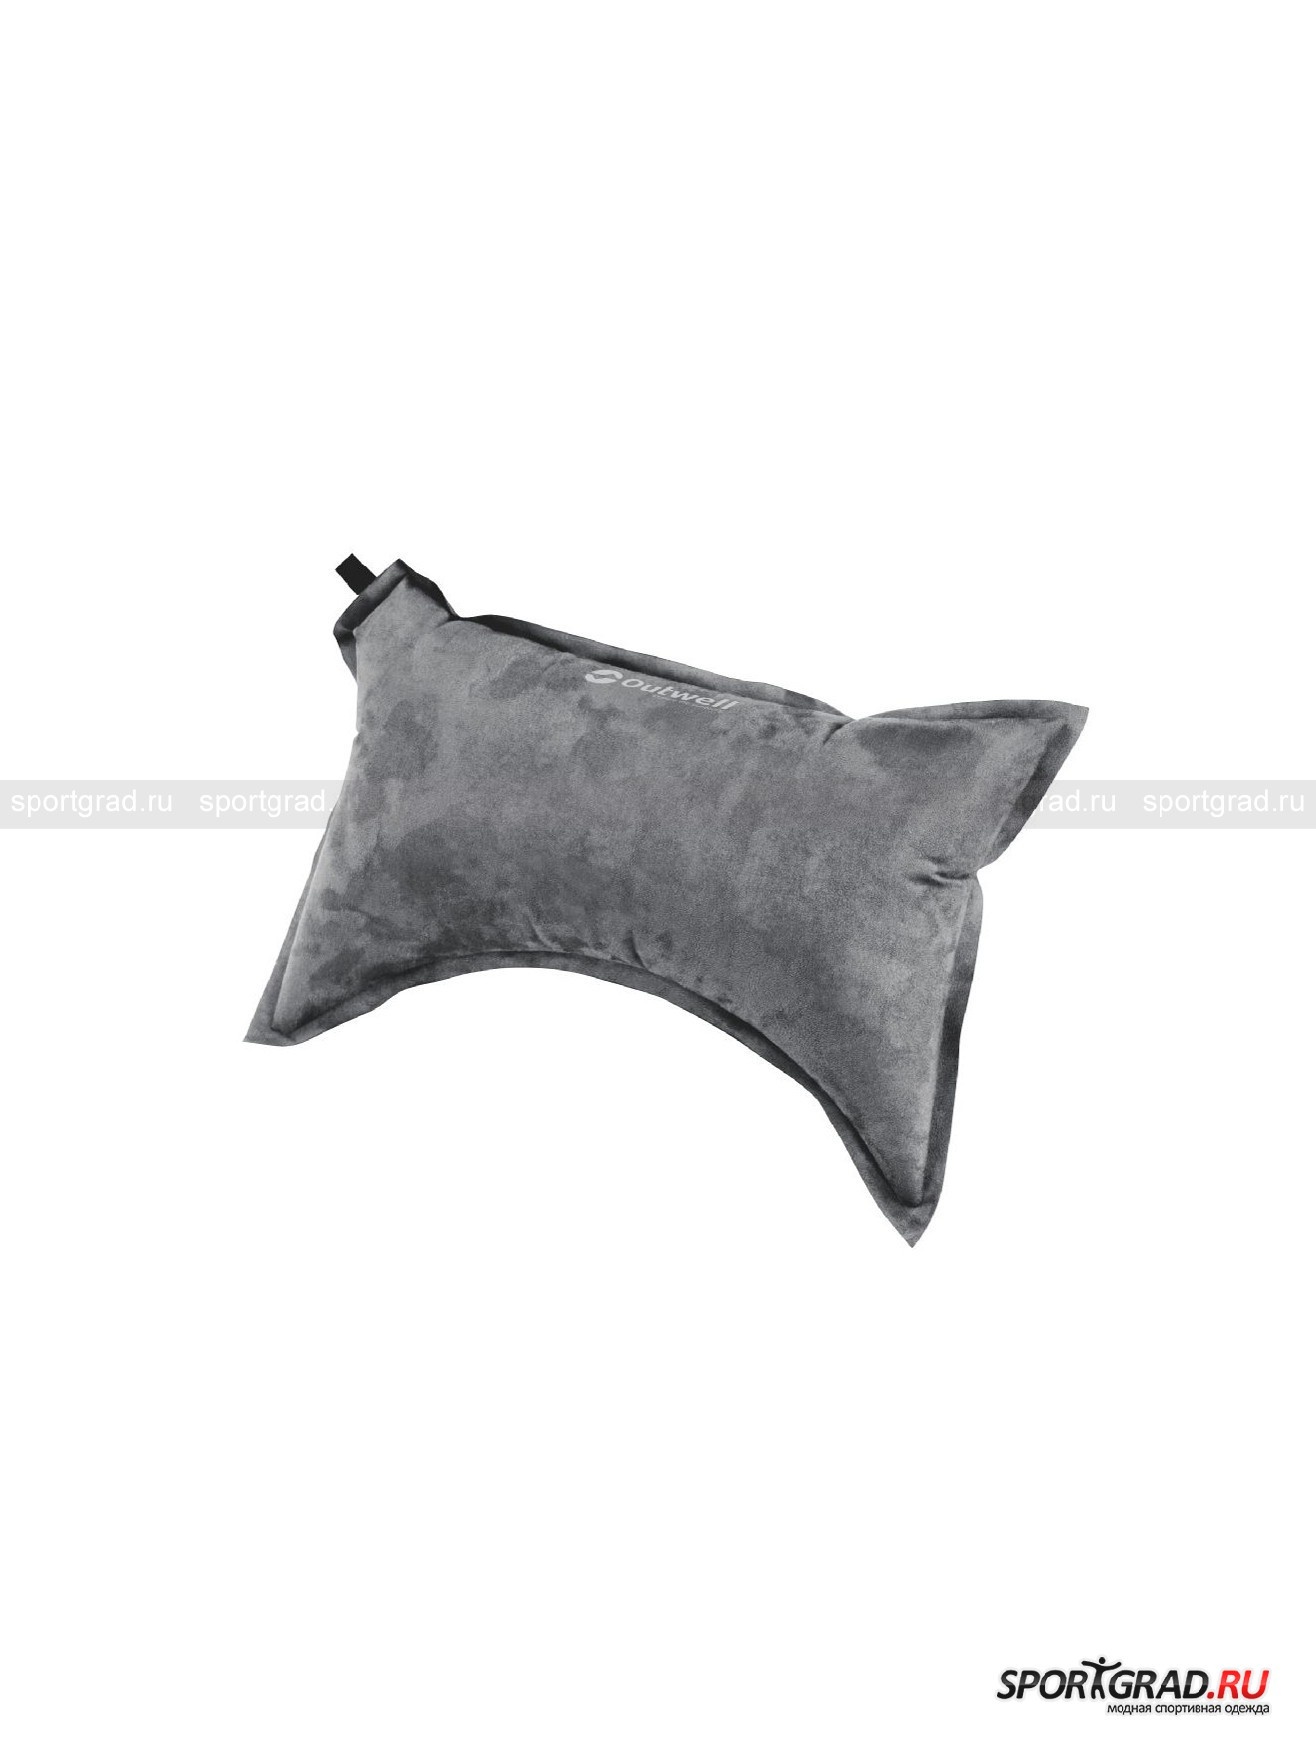 Надувная подушка Deepsleep Moon-shaped pillow Outwell от Спортград